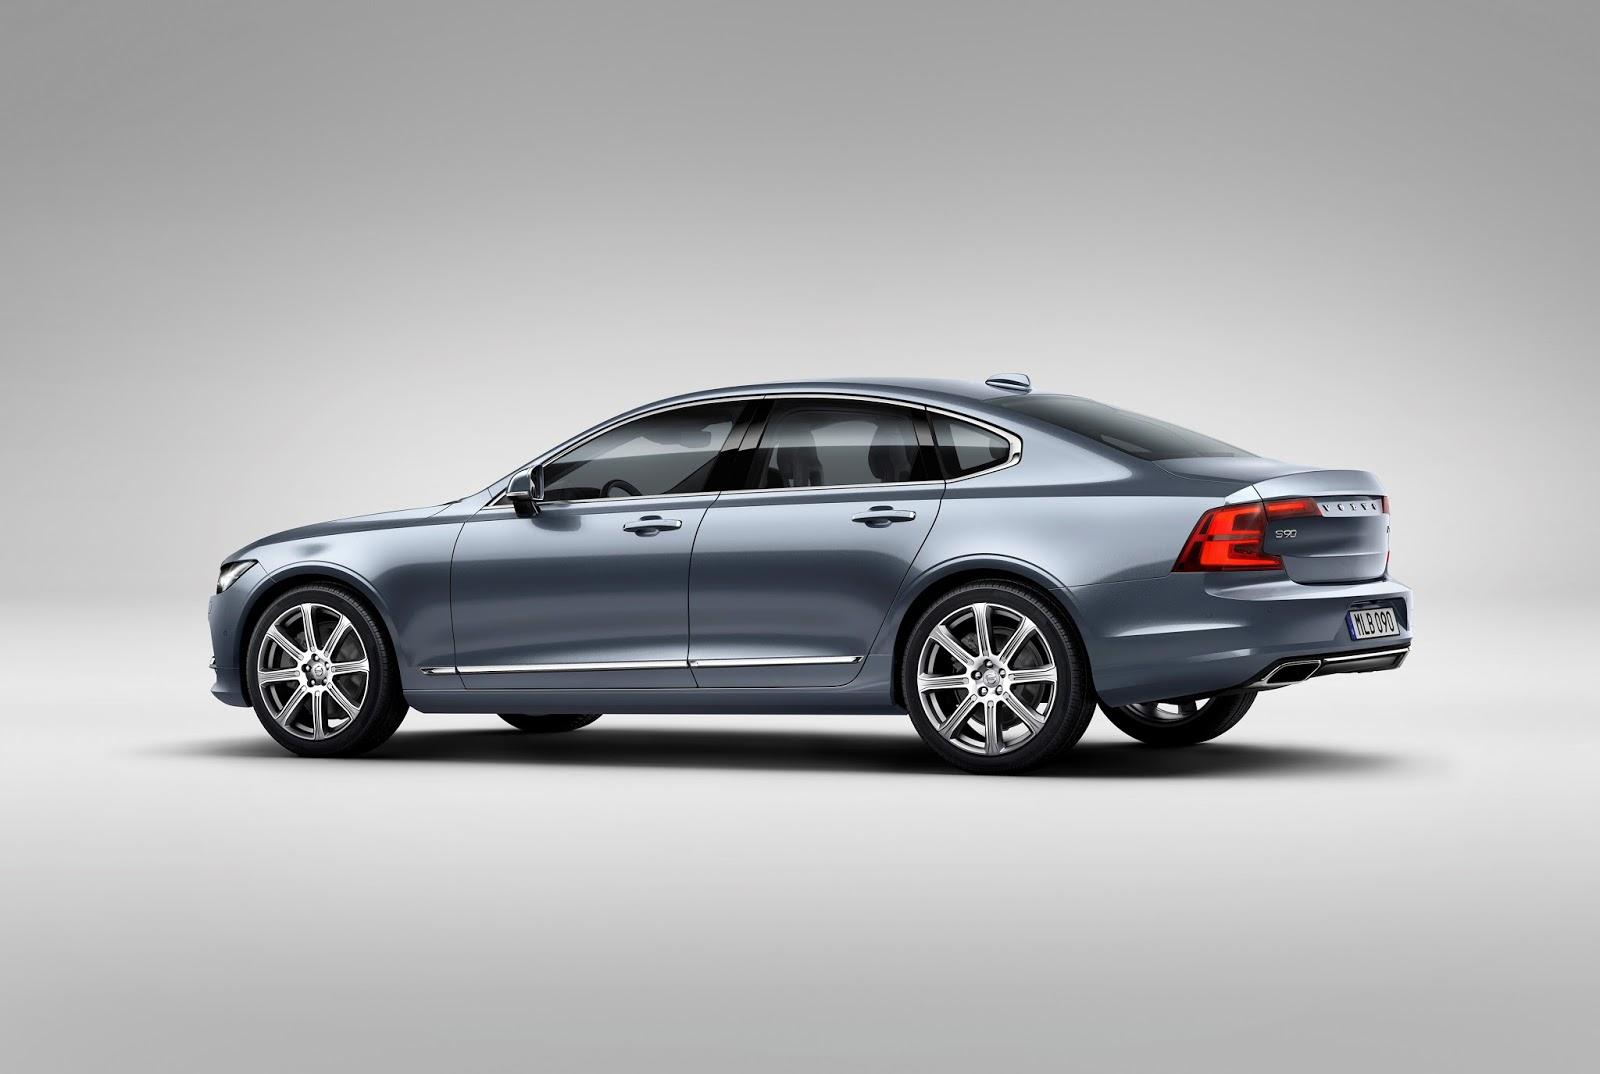 170087 Rear Quarter Volvo S90 Mussel Blue Το νέο Volvo S90 έρχεται και βάζει φωτιά στον ανταγωνισμό premium sedan, Volvo, Volvo Cars, Volvo S90